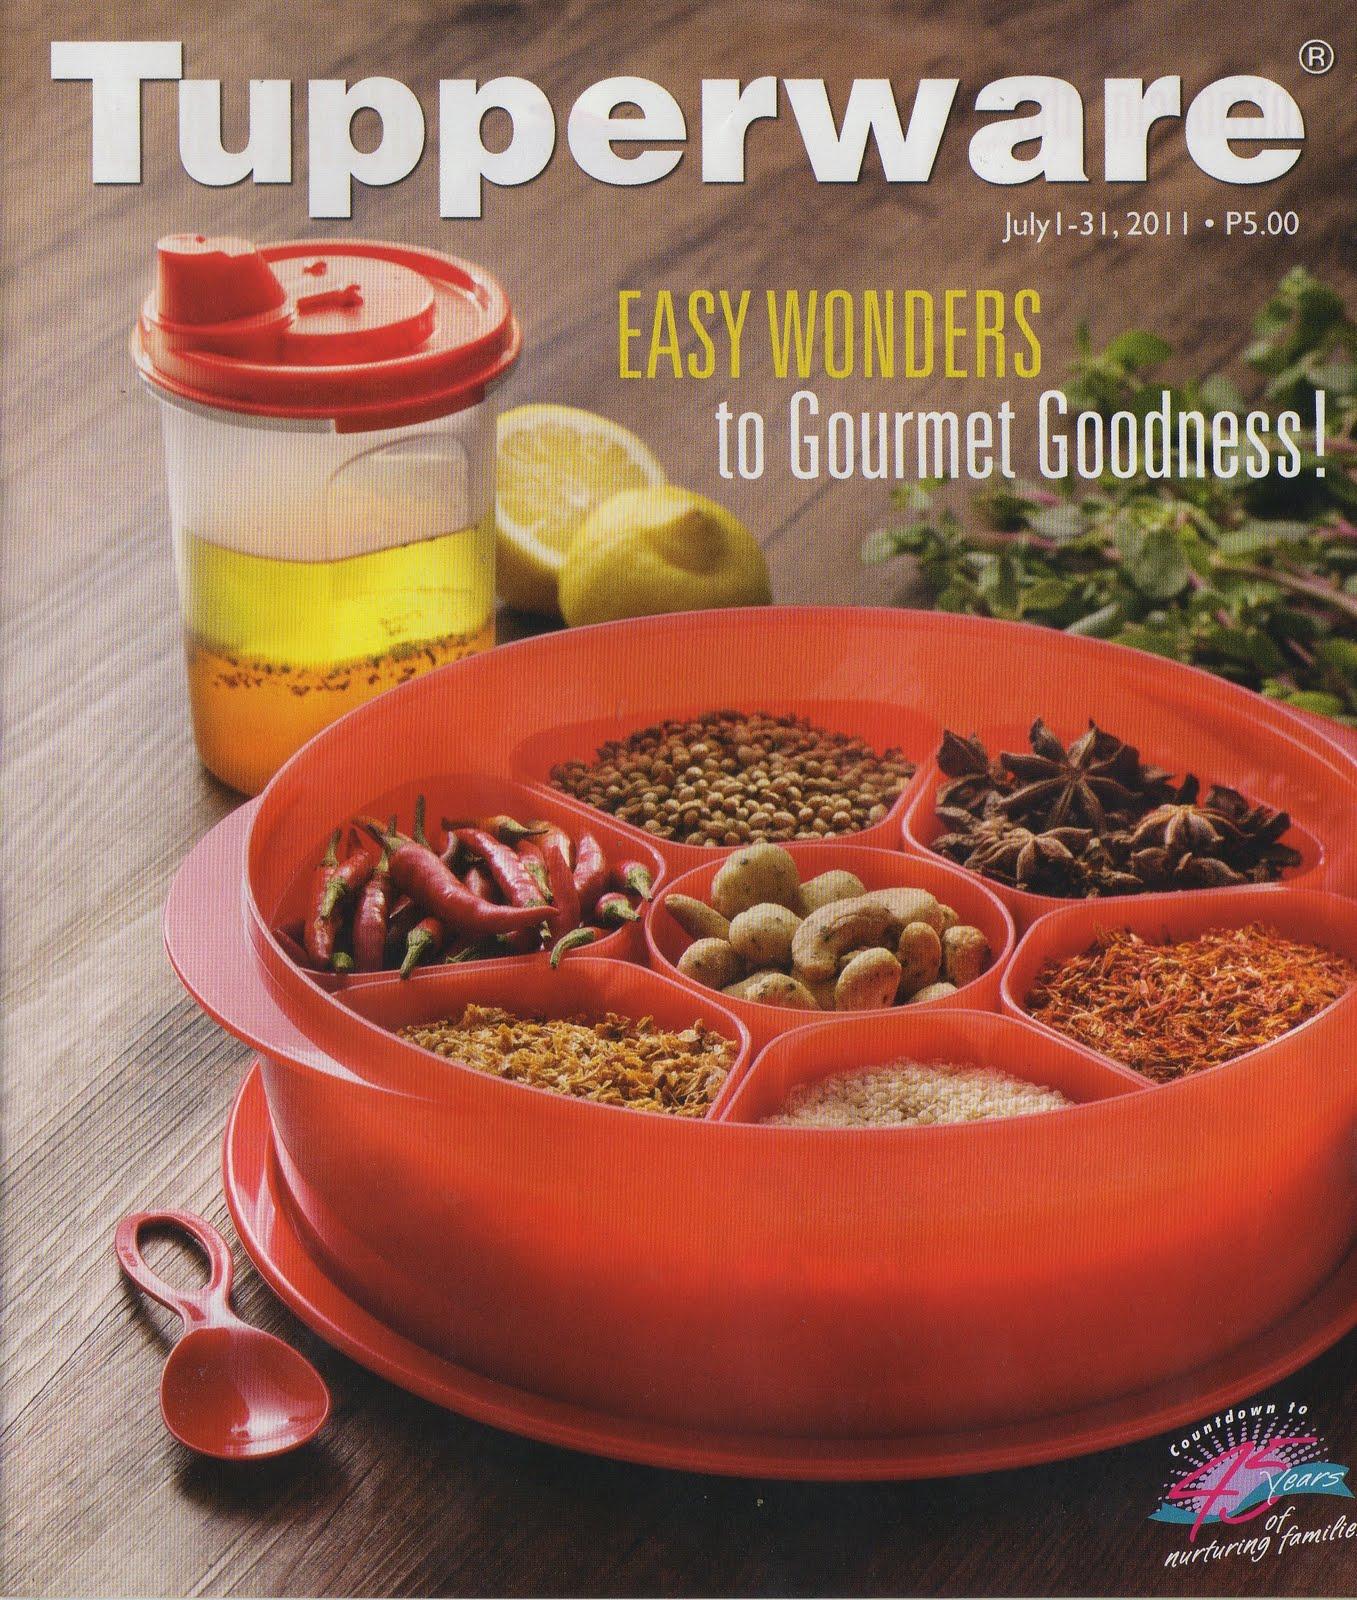 TupperWare Catalog July 2011